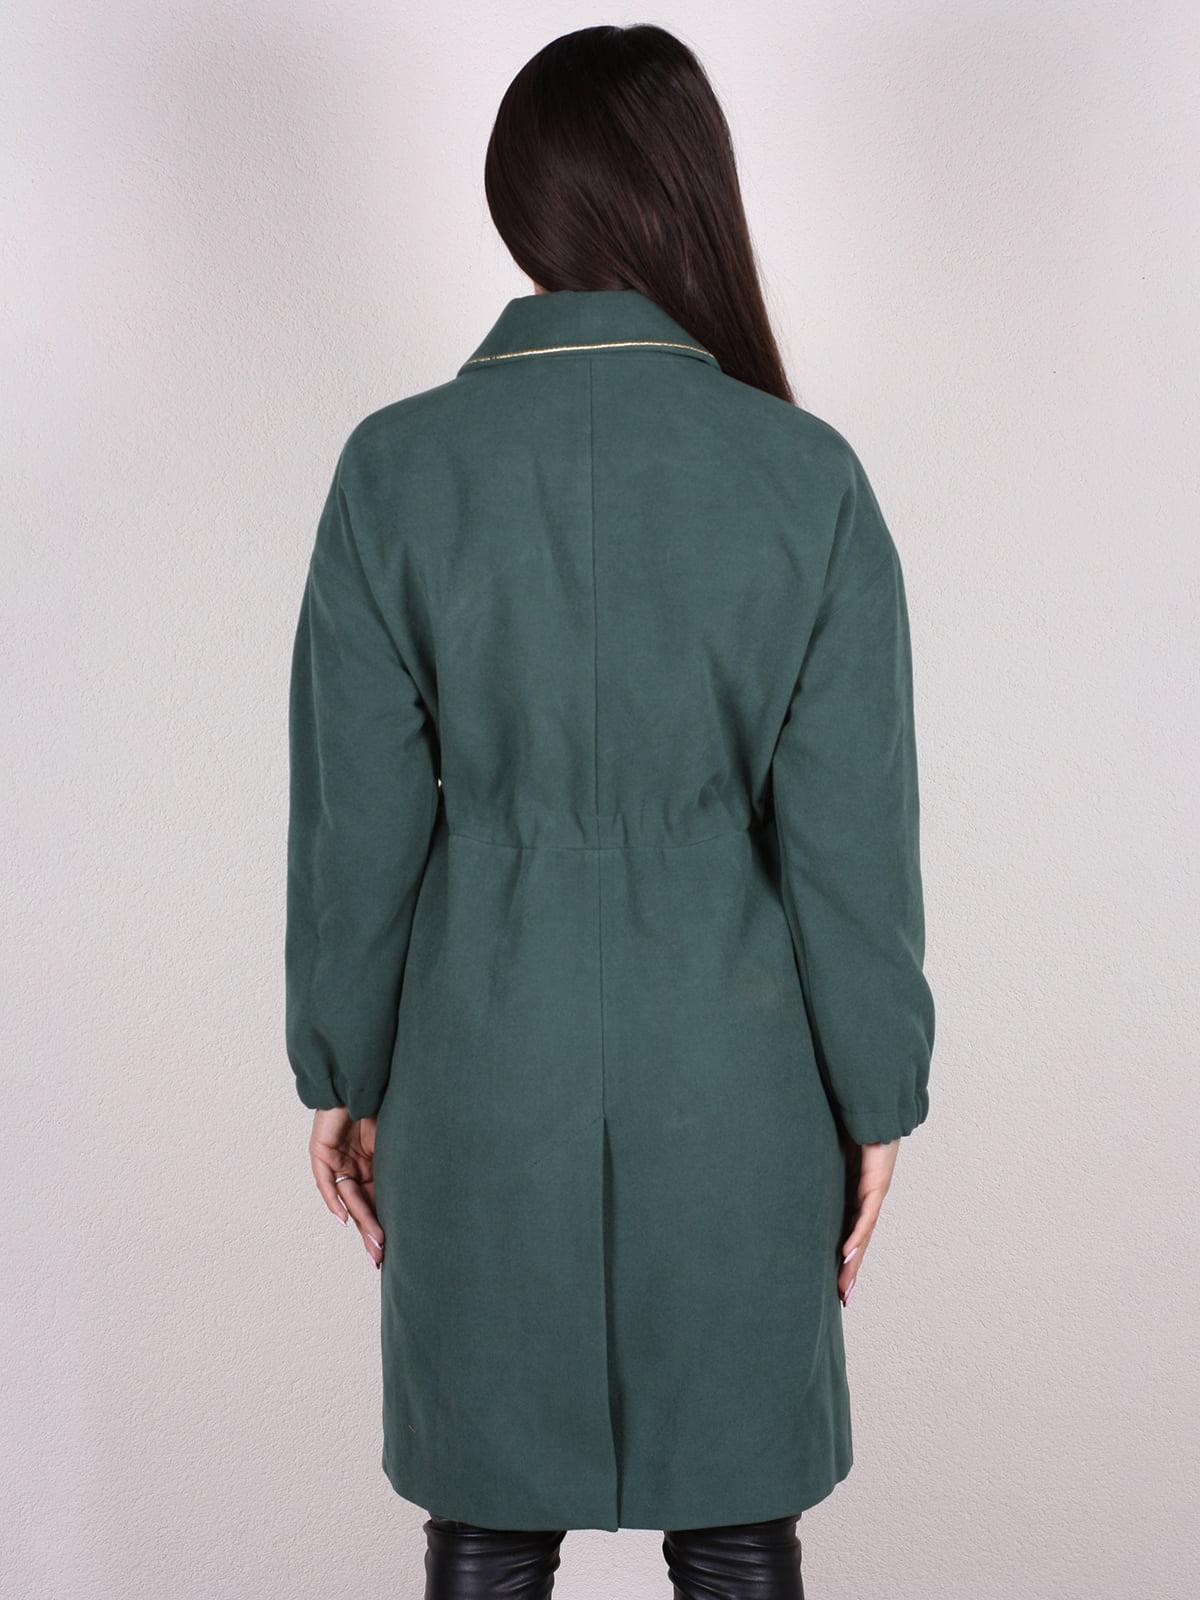 Пальто темно-зеленое | 4922385 | фото 3